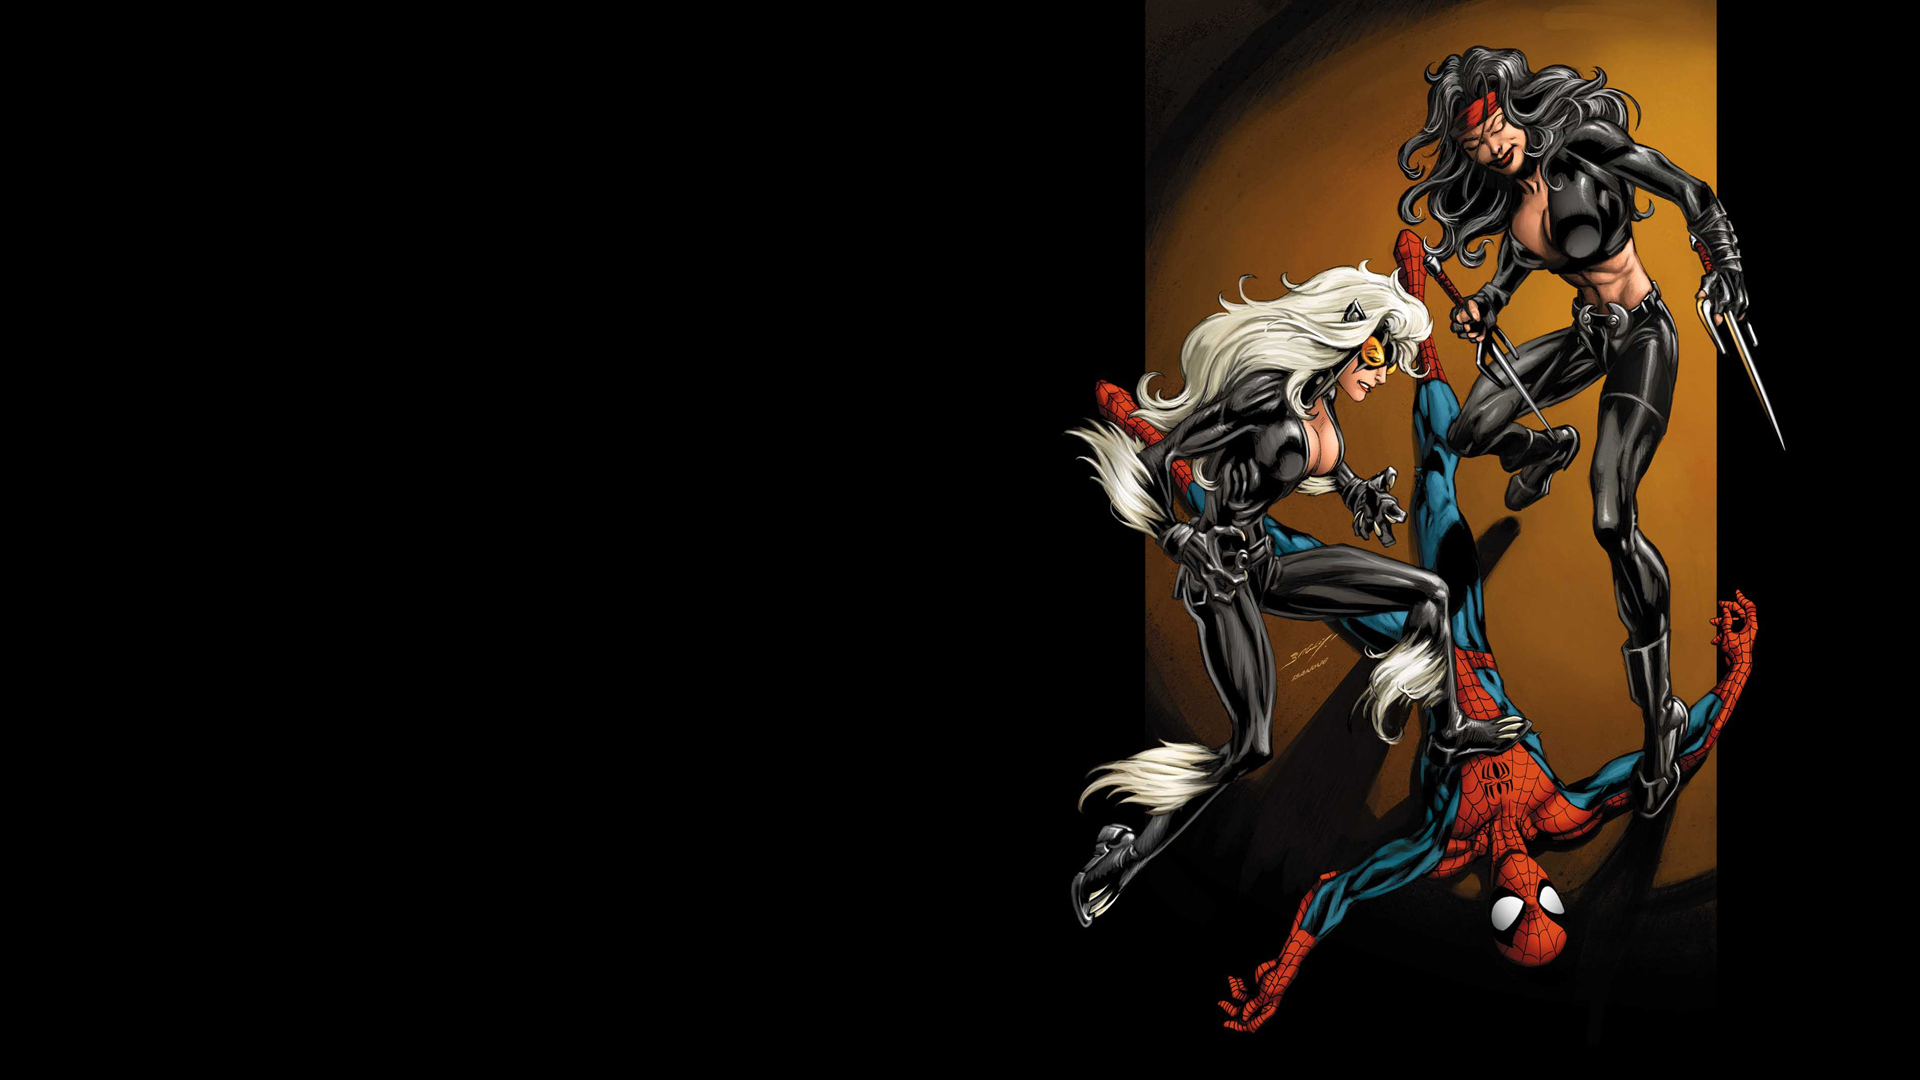 Spiderman Comics Spider Man Superhero Wallpaper